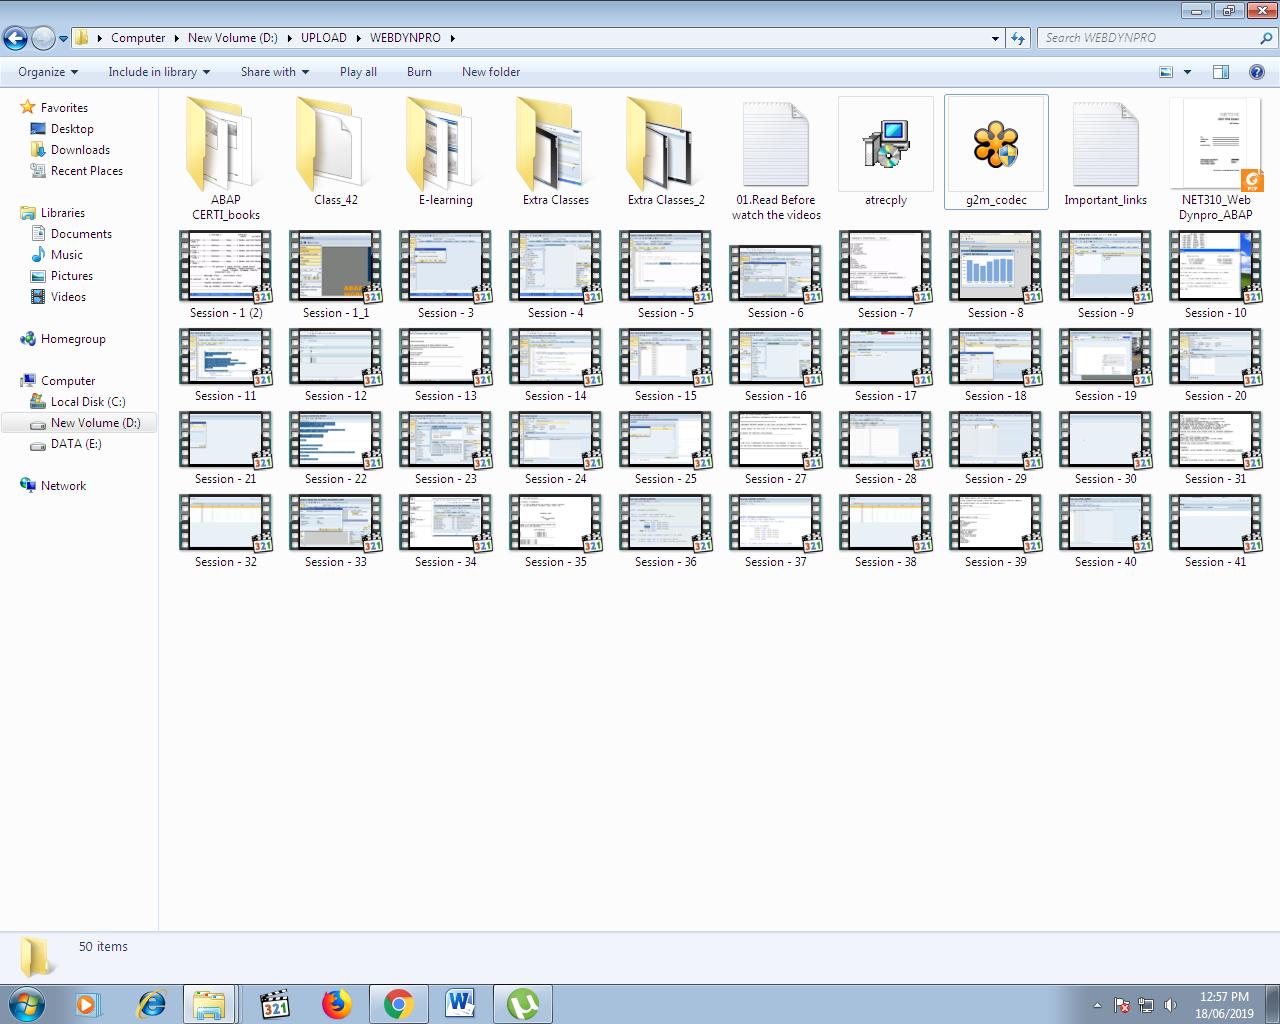 SAP Web Dynpro ABAP Complete Video Series (6 14 GB